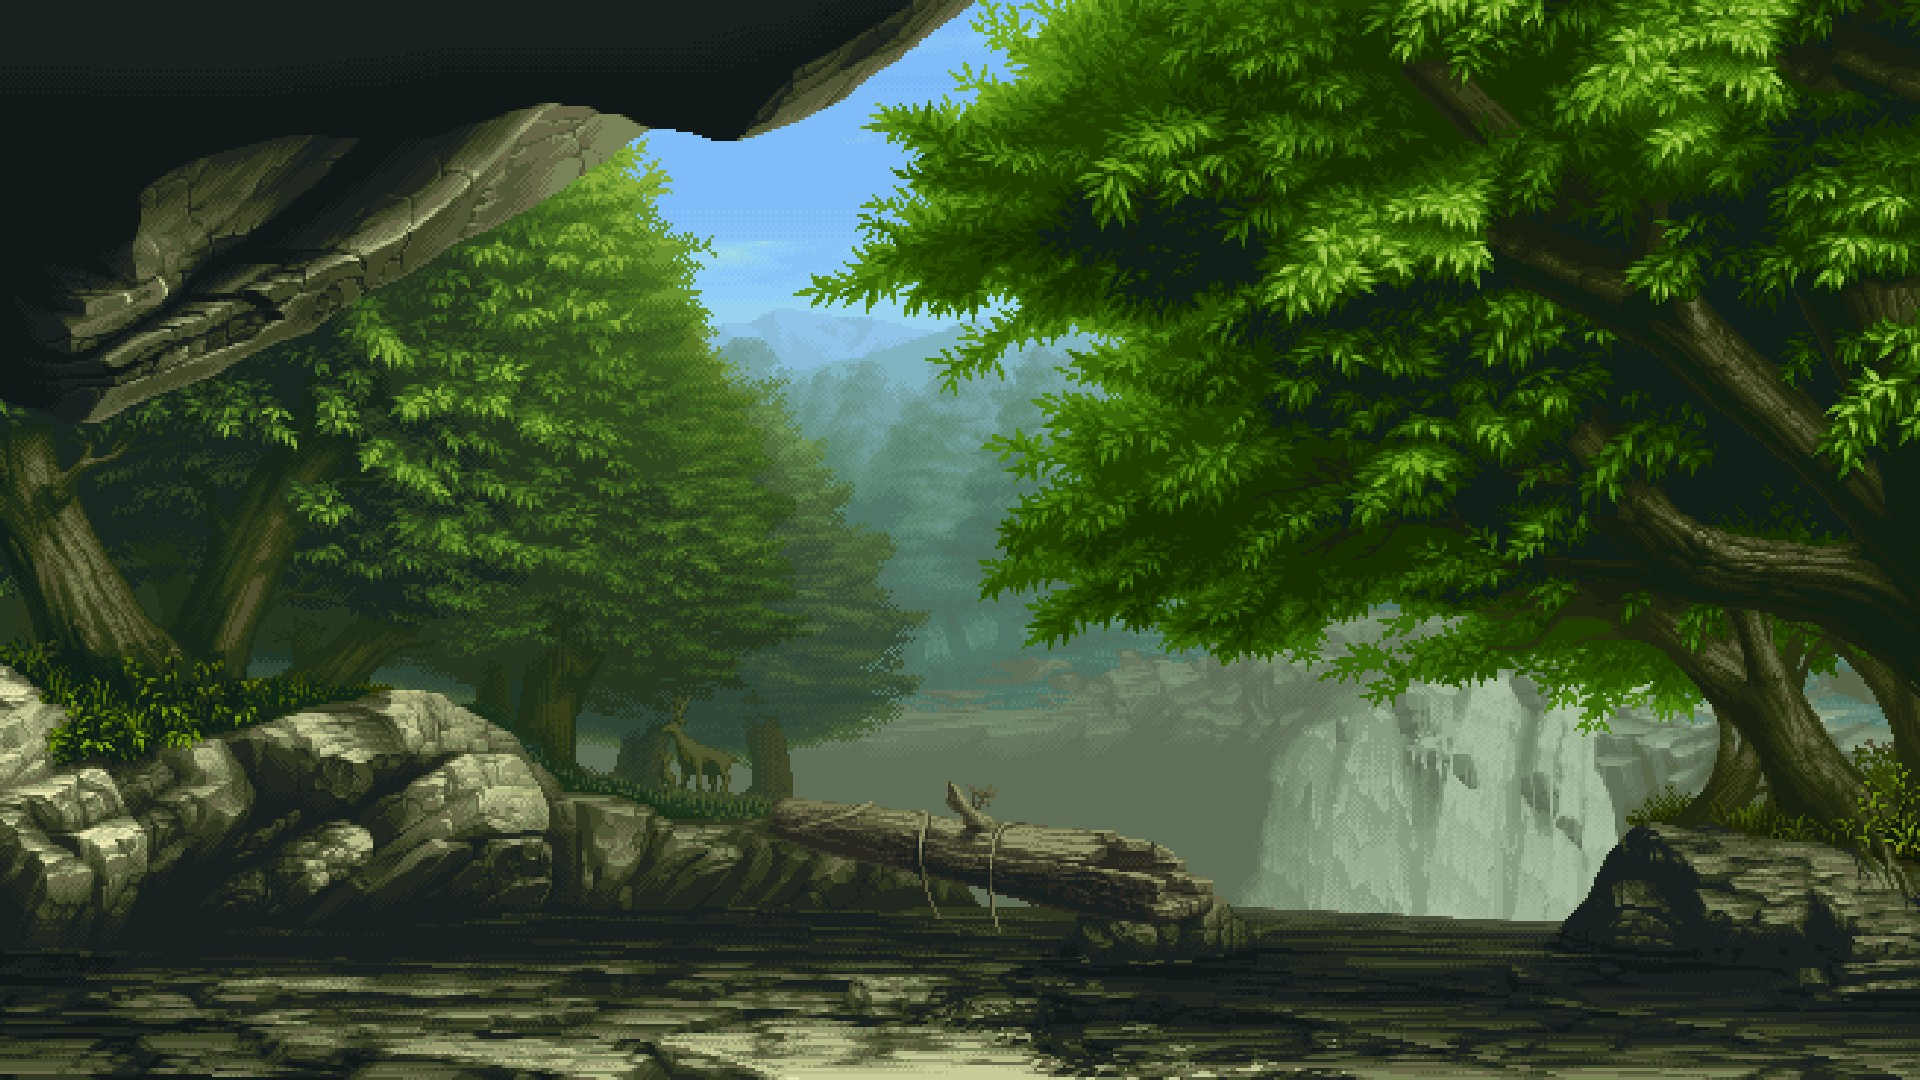 Unduh 600+ Wallpaper Tumblr Hd Landscape HD Terbaru